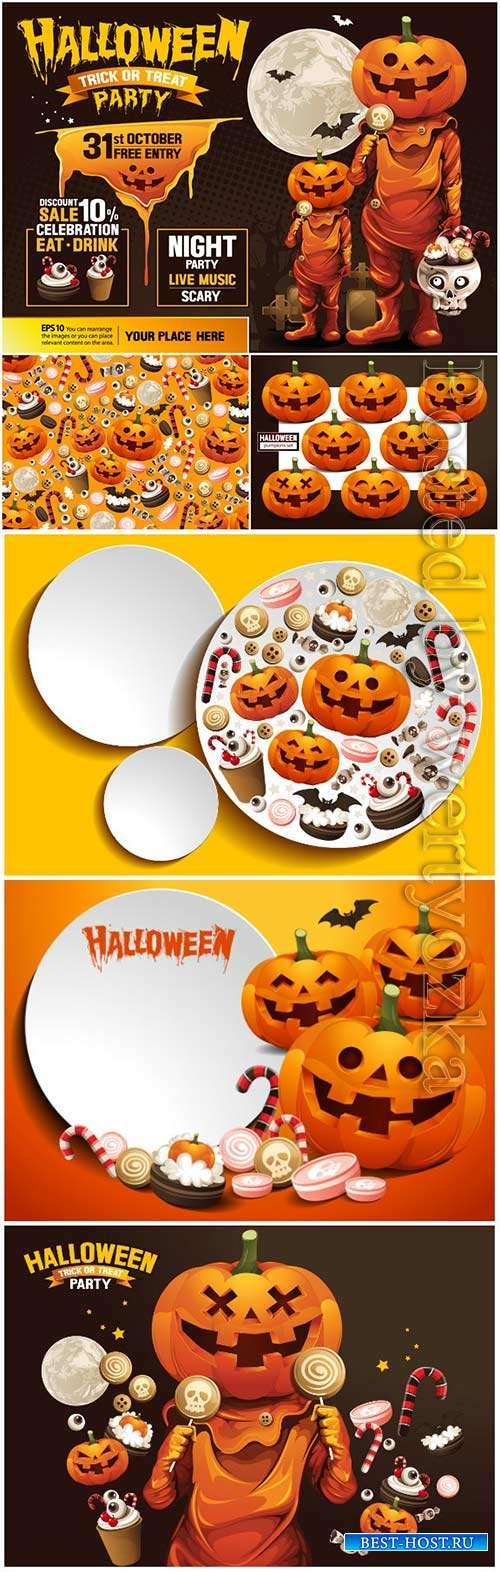 Happy halloween vector, ghost, treat or trick